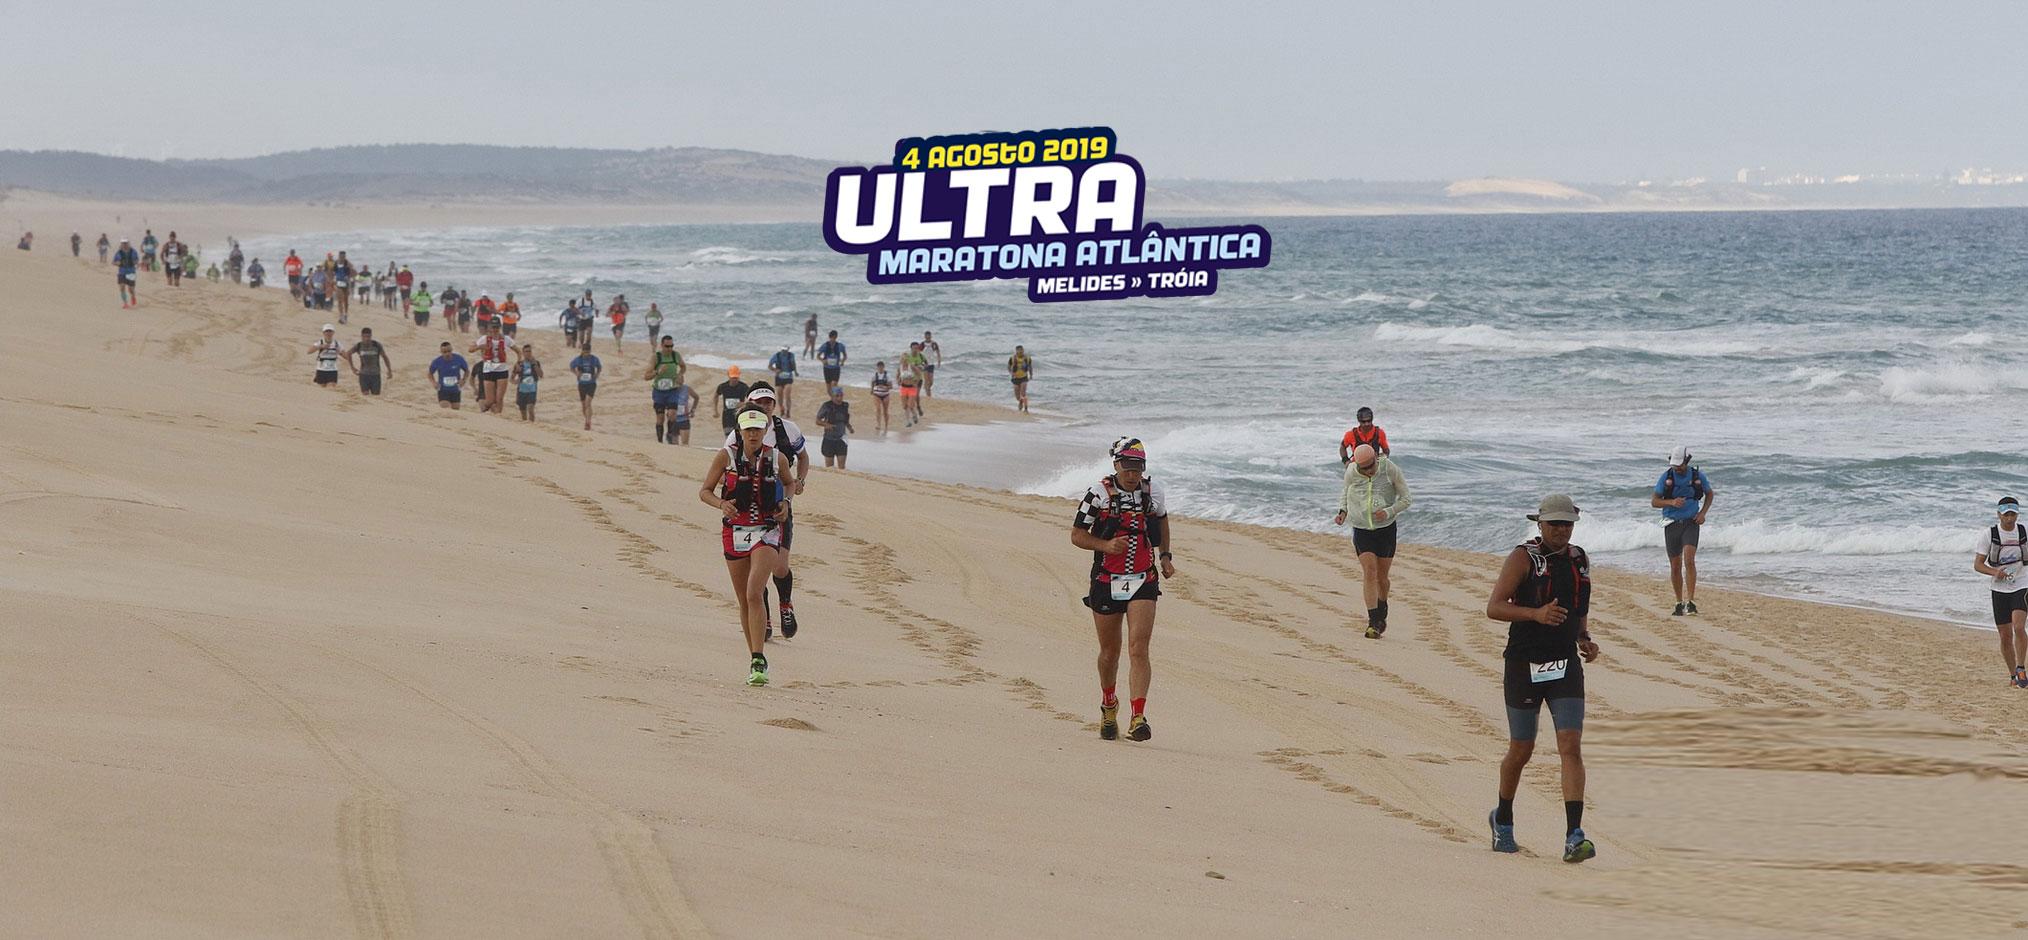 Ultra Maratona Atlântica